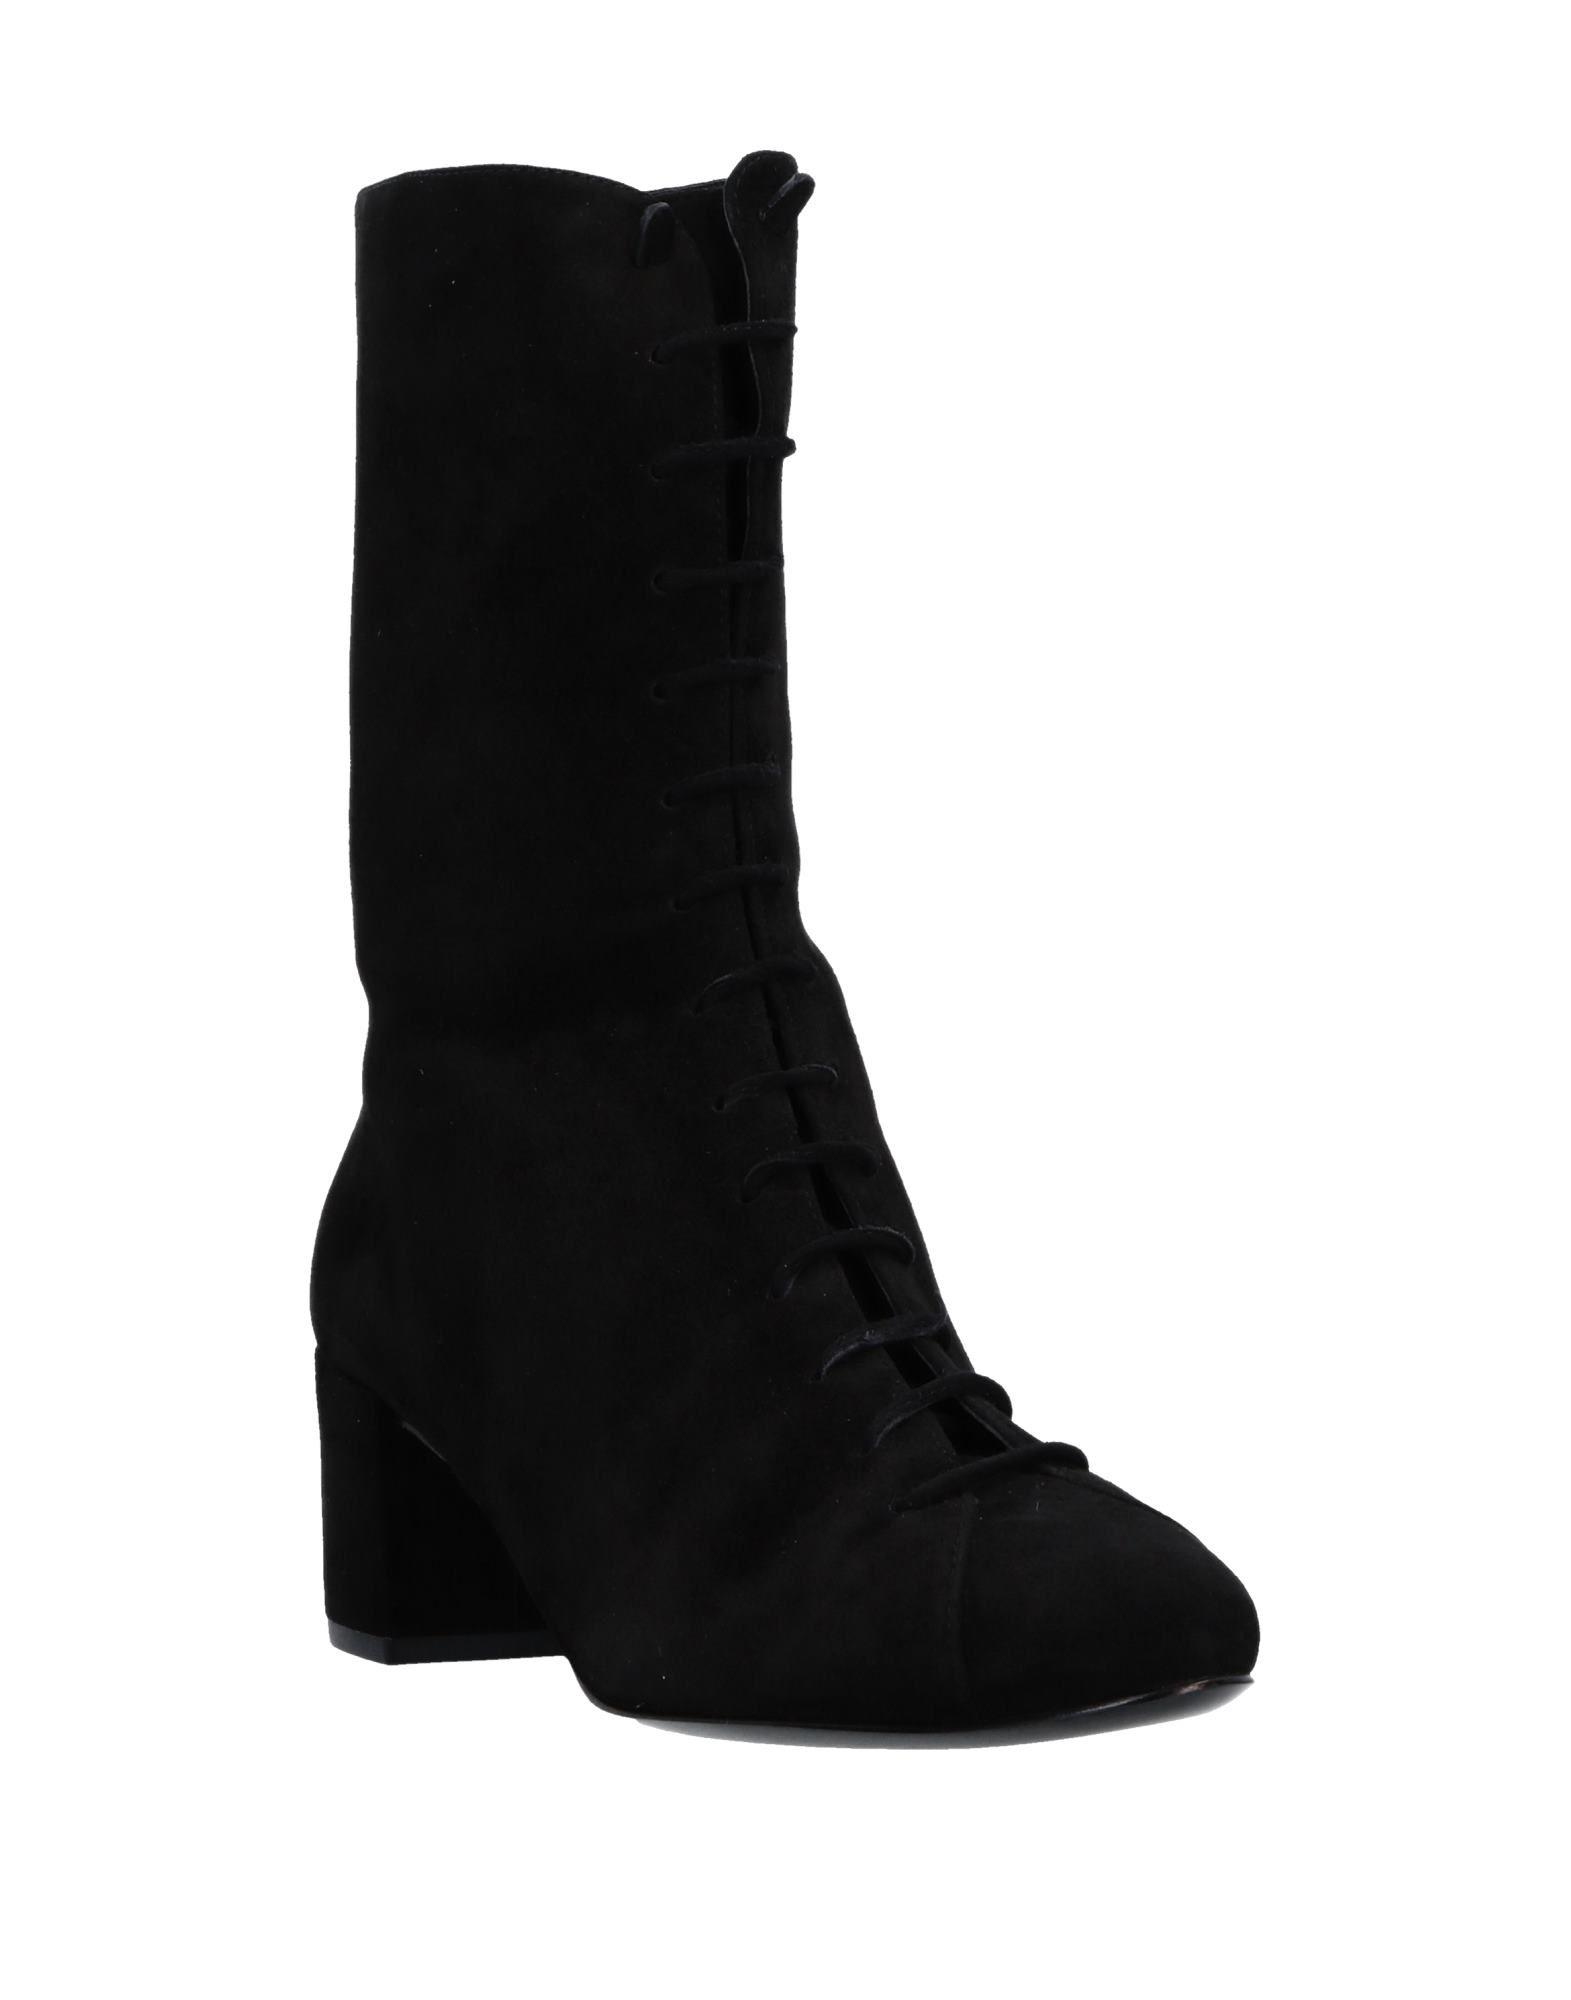 Stella Luna Stiefelette 11539430EO Damen  11539430EO Stiefelette Neue Schuhe 4f5dde